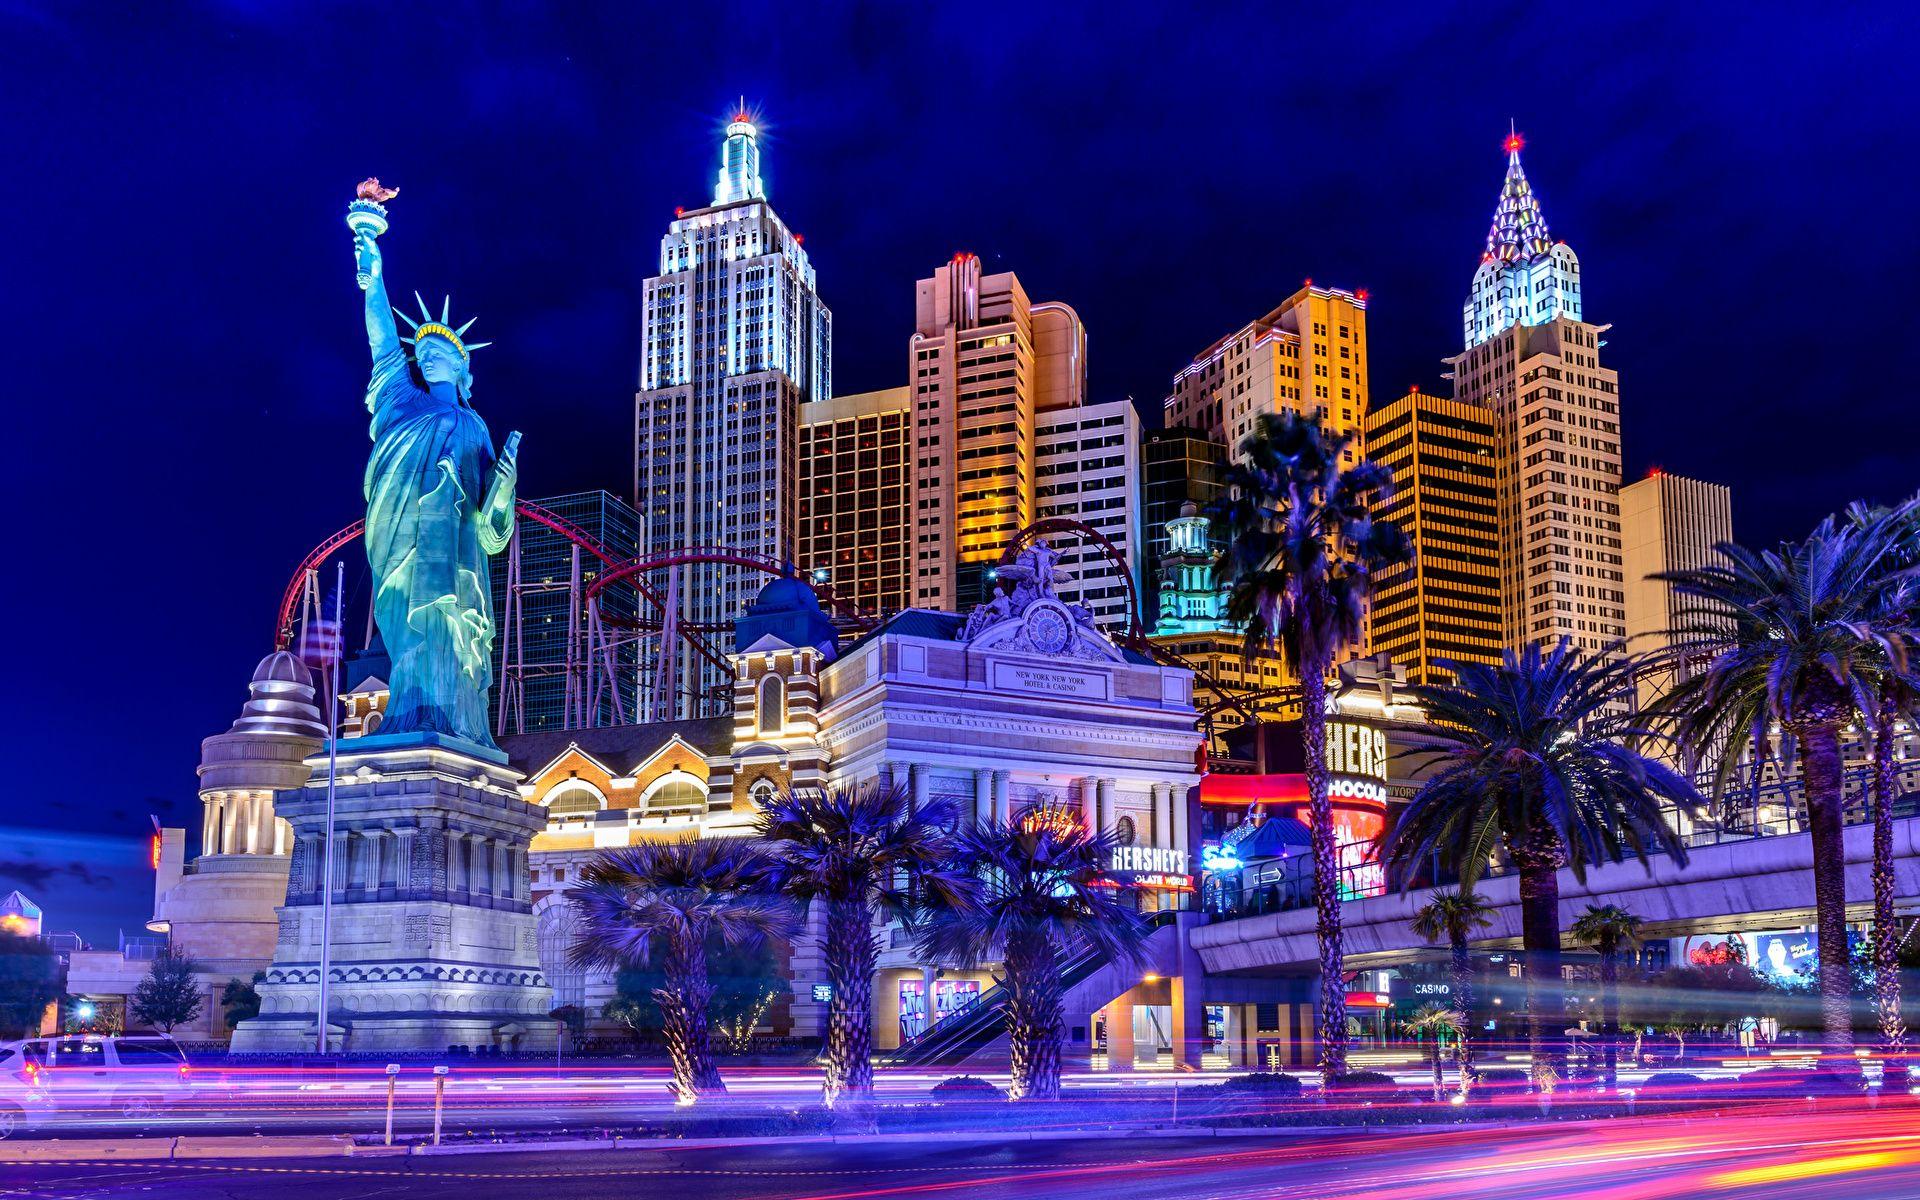 Houses Las Vegas 1920x1200 In 2019 Las Vegas Photos